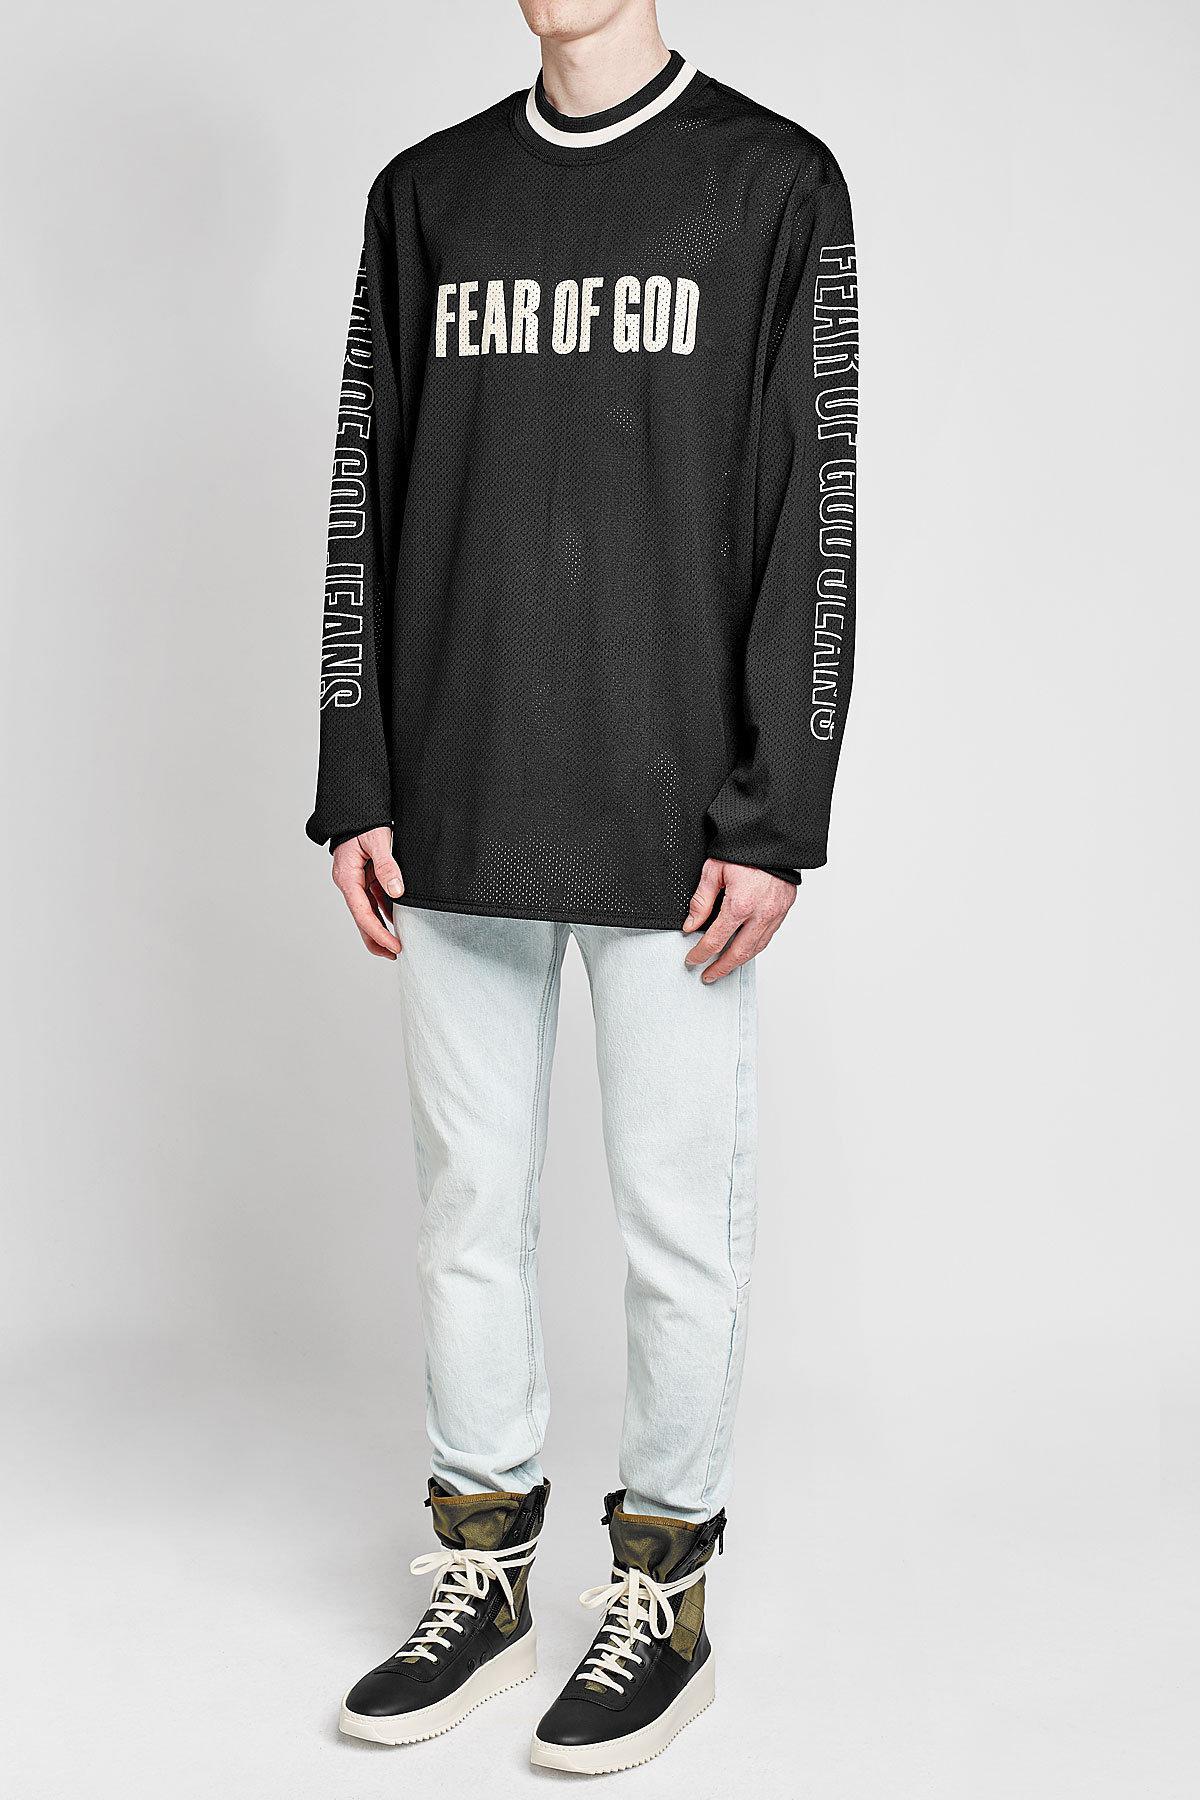 FEAR OF GOD Grey Jungle High-Top Sneakers JVAAJ